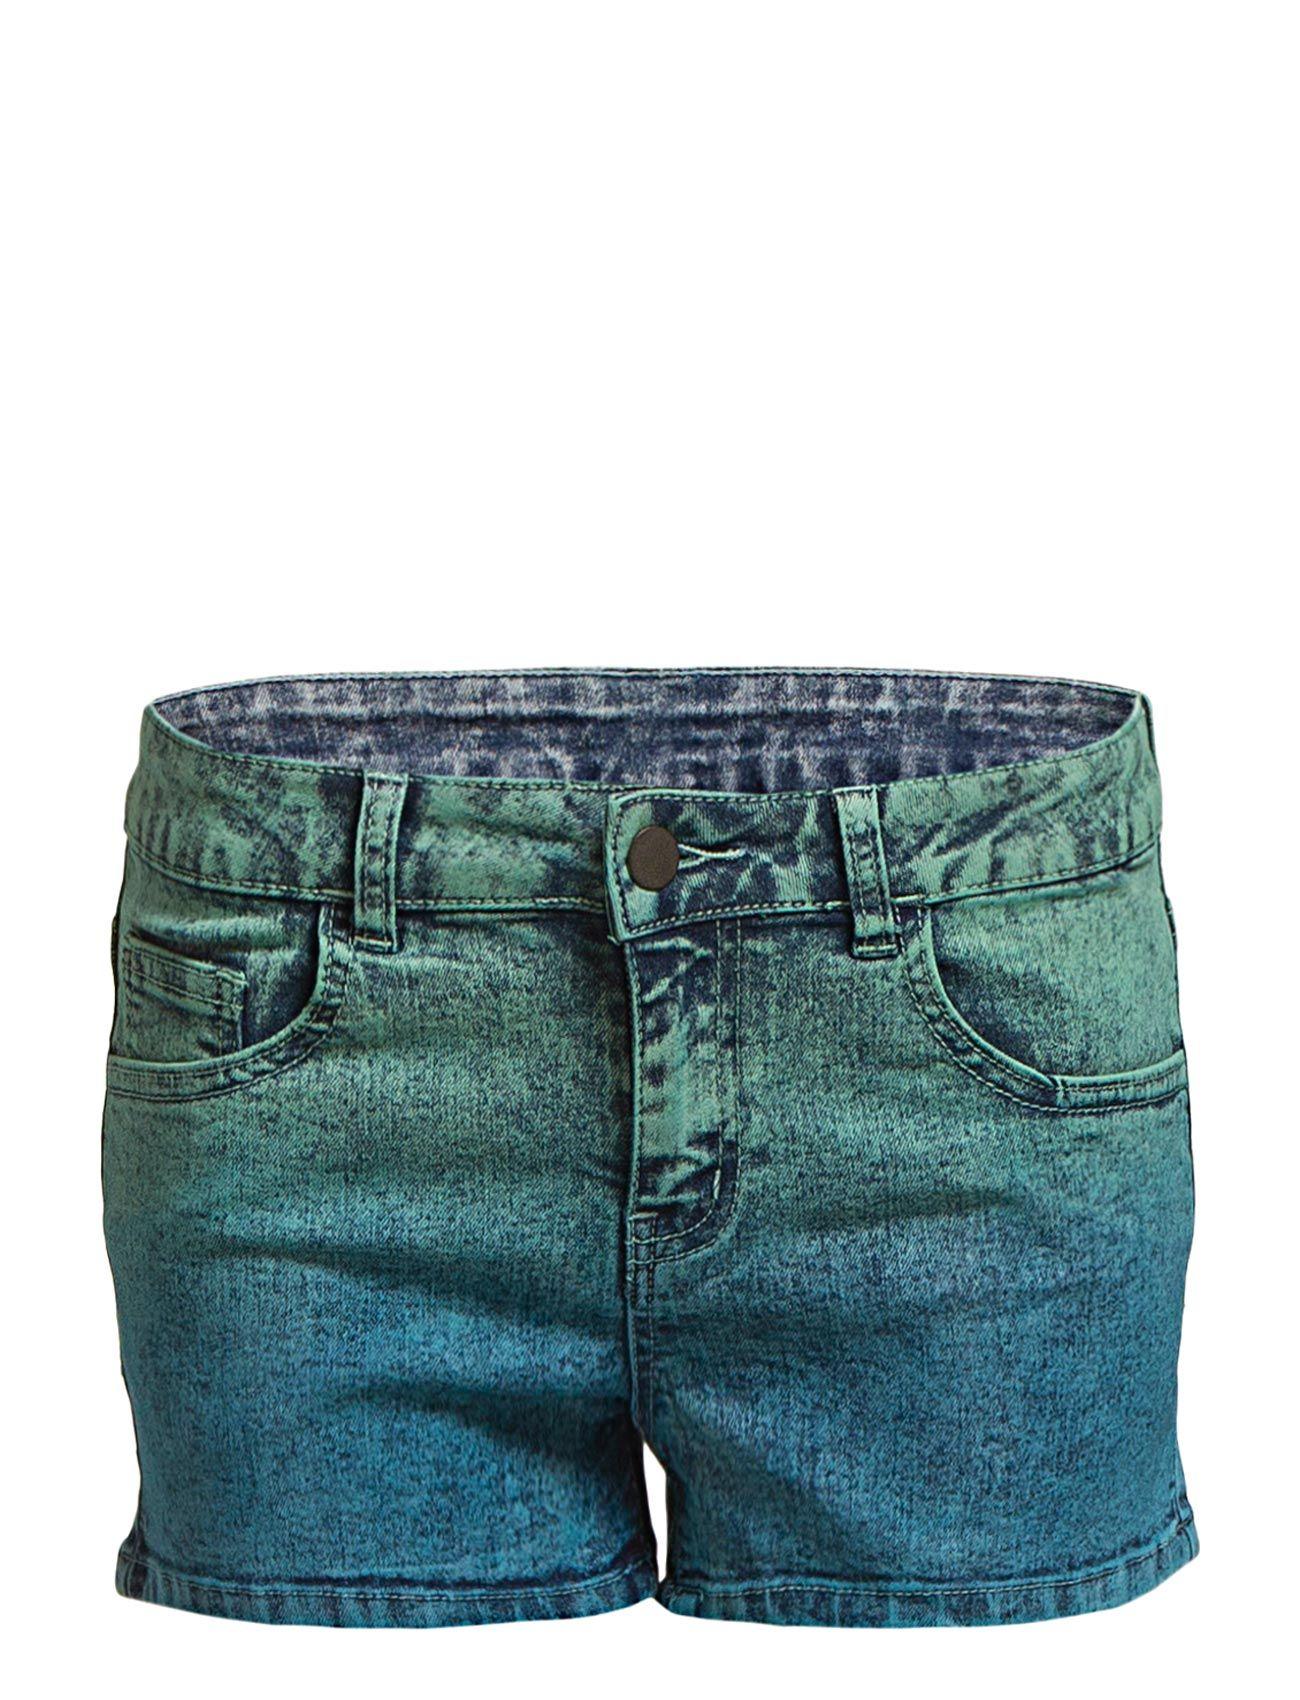 Funky Gabri Shorts/Mix Box